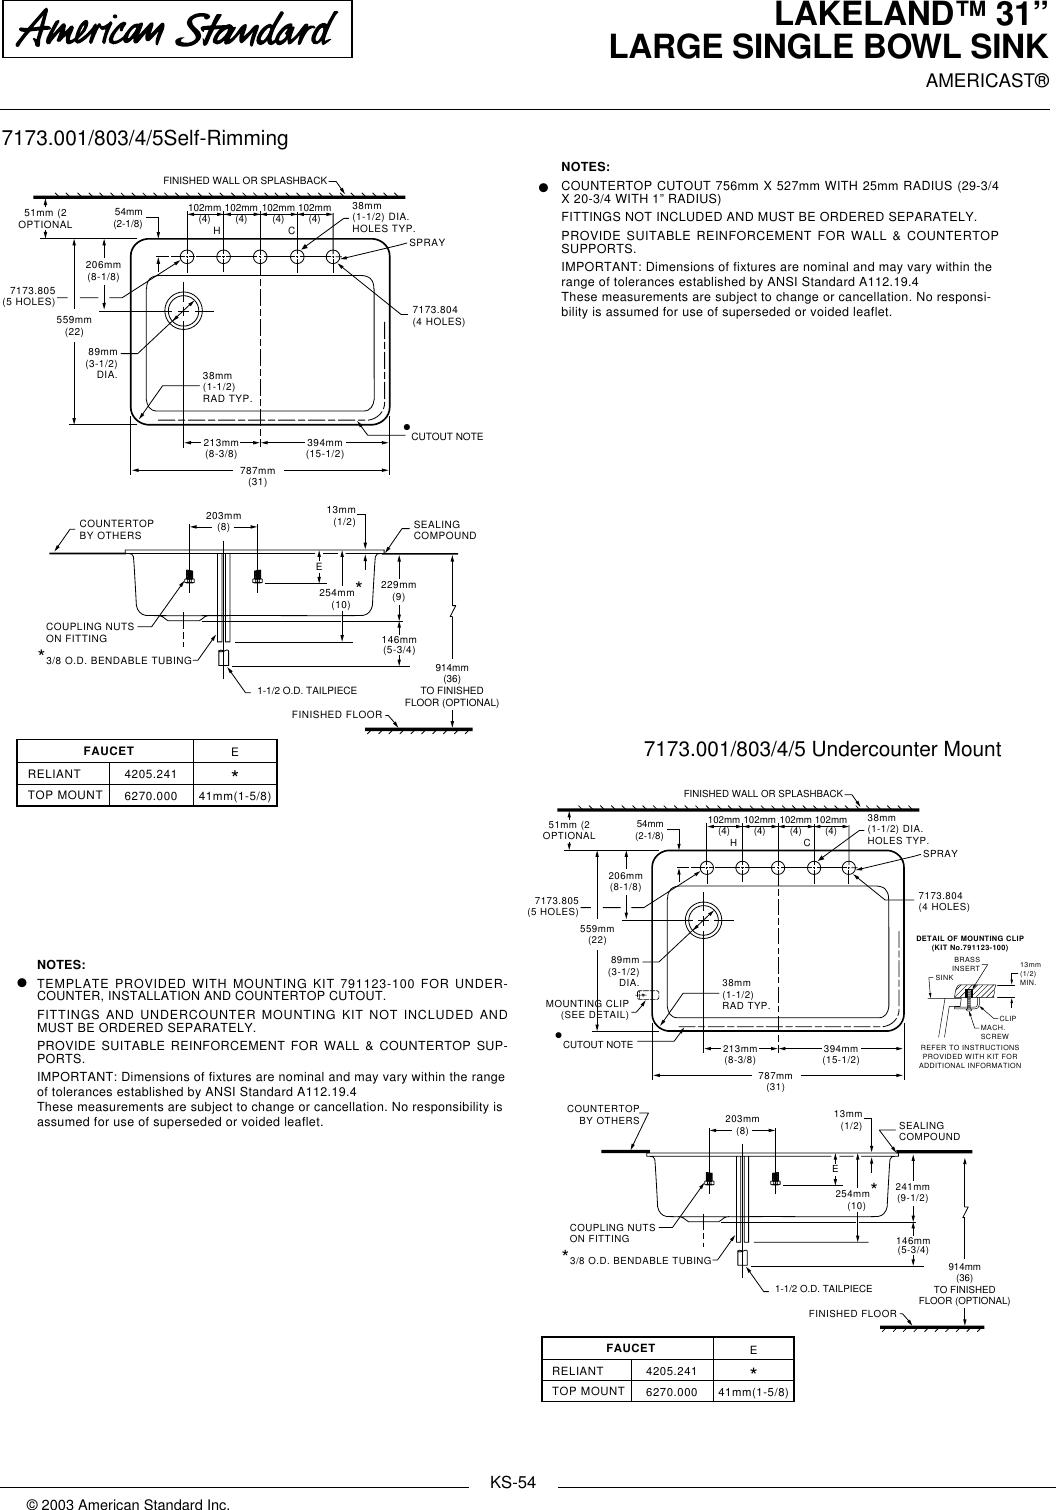 Page 2 of 2 - American-Standard American-Standard-Lakeland-31-Large-Single-Bowl-Sink-7173-001-Users-Manual- KITCHEN SINKS  American-standard-lakeland-31-large-single-bowl-sink-7173-001-users-manual